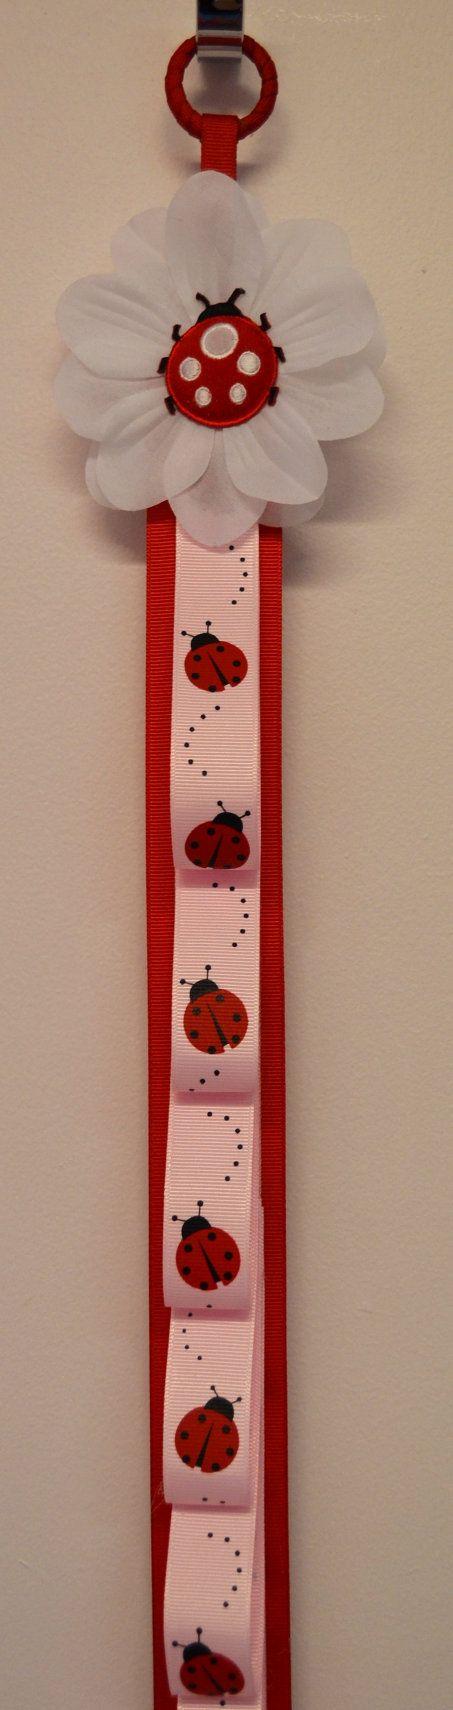 Ladybug Ribbon Headband Holder by Funnygirldesigns on Etsy, $22.00